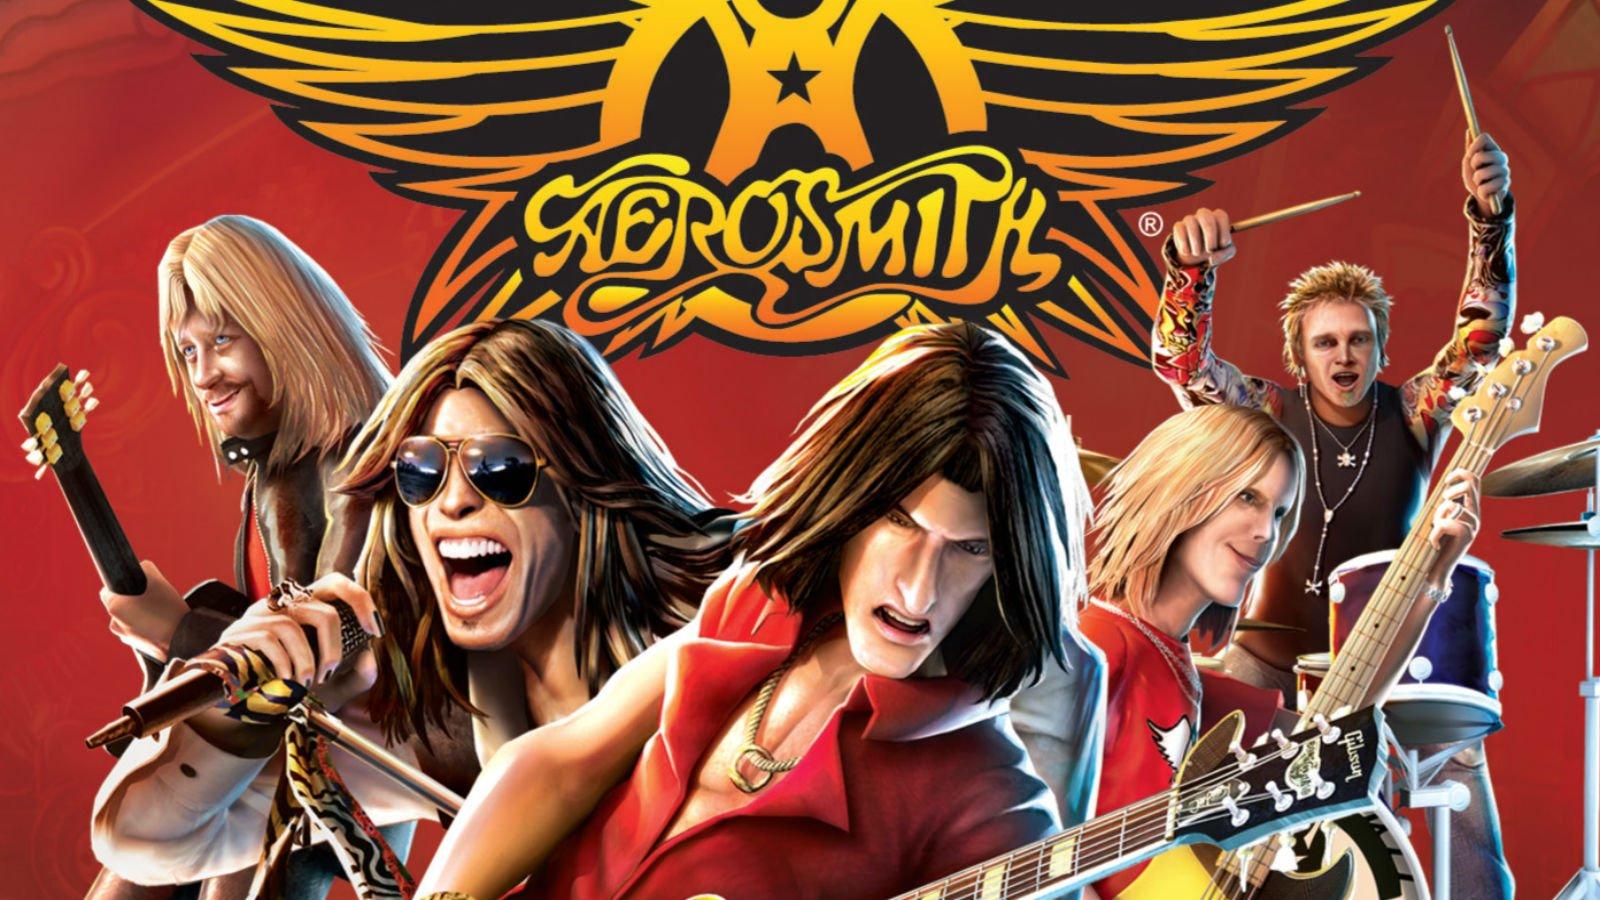 Guitar Hero Music Guitars Heavy Metal Rock Hard 1ghero Rhythm Guitarhero Poster Aerosmith Wallpaper 1600x900 644805 Wallpaperup